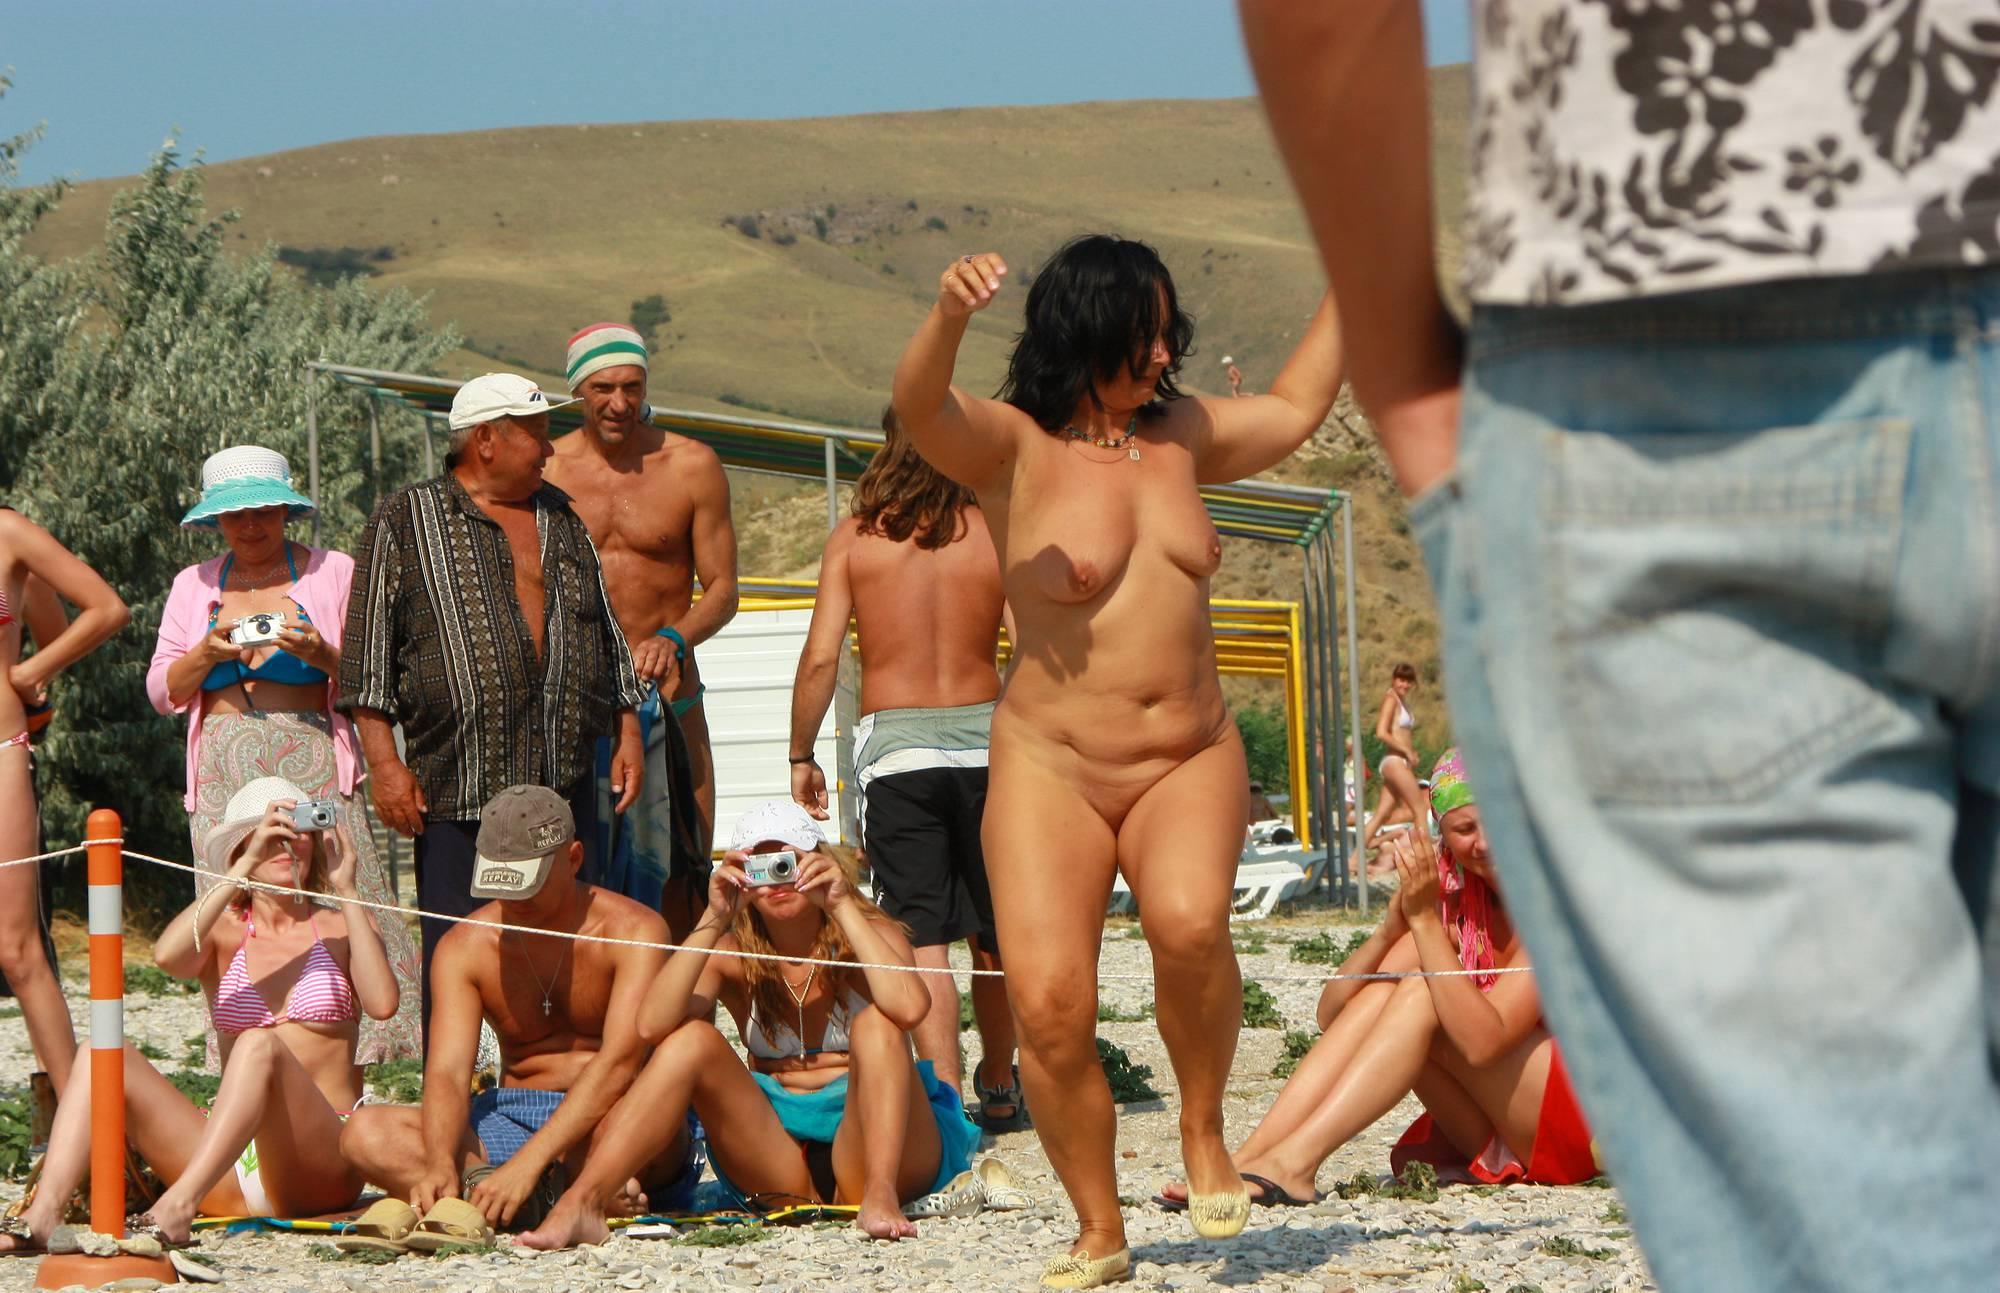 Pure Nudism Images Neptune Woman Dancing - 2